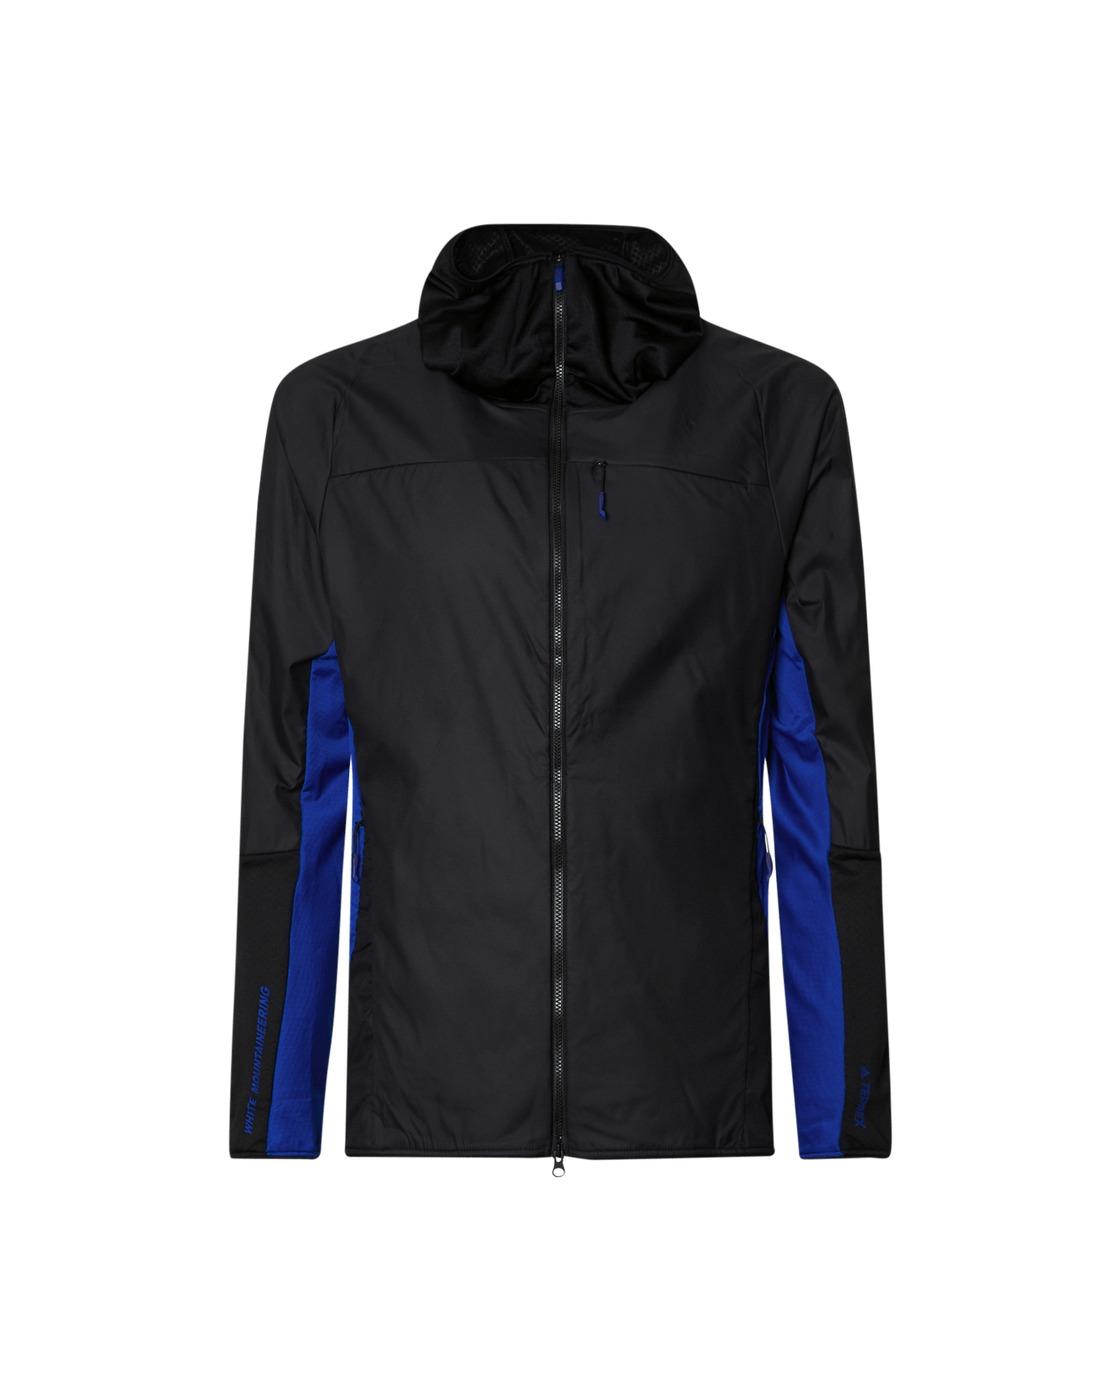 Photo: Adidas Originals Adidas X Terrex White Mountaineering Fleece Sportscoat Jacket Black